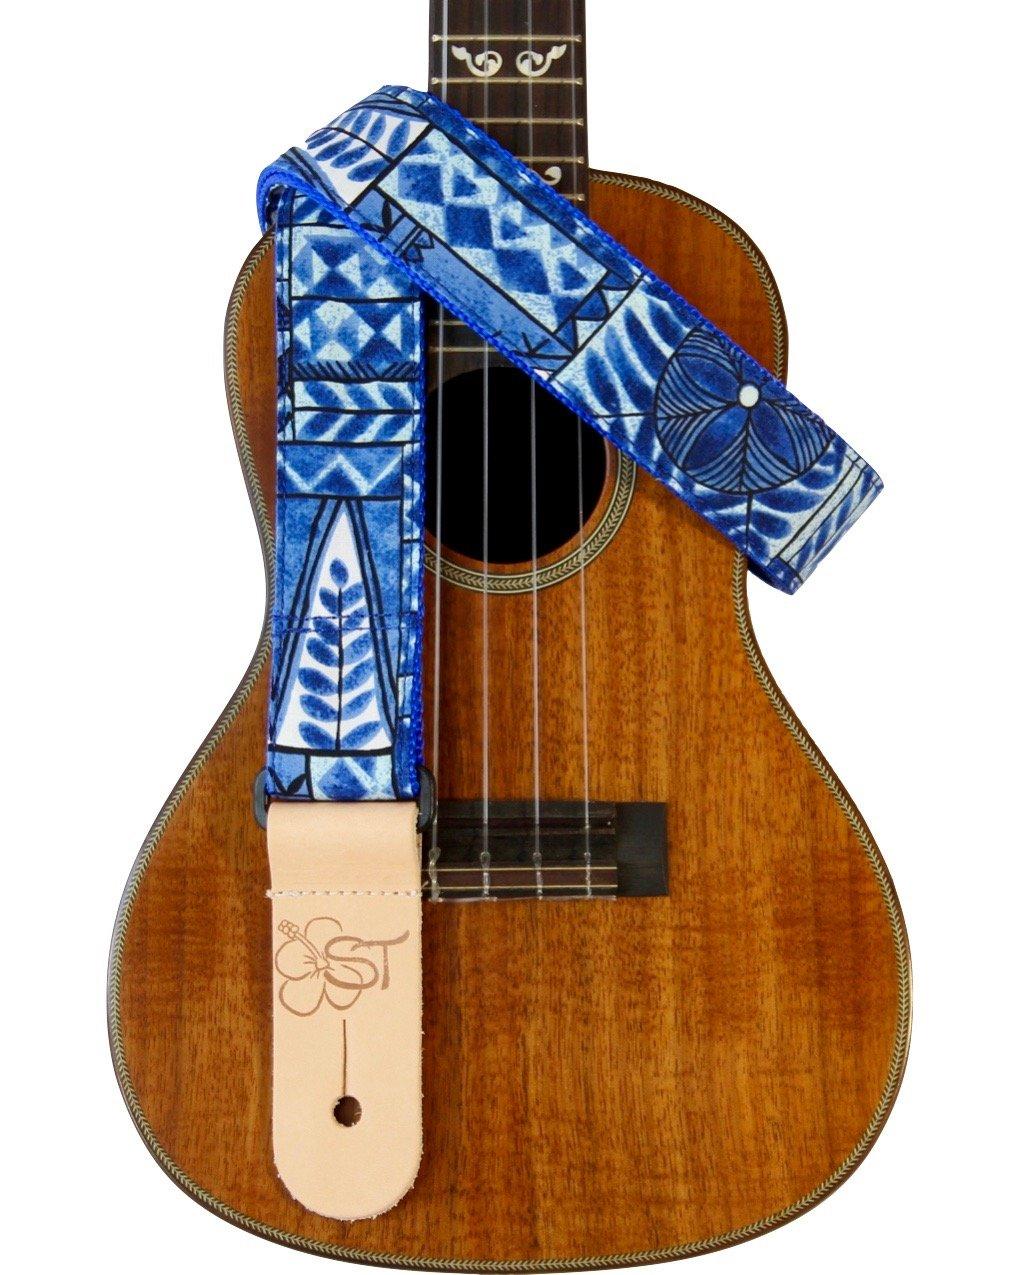 Sherrin's Threads 1.5 Hawaiian Print Ukulele Strap - Ocean Tapa